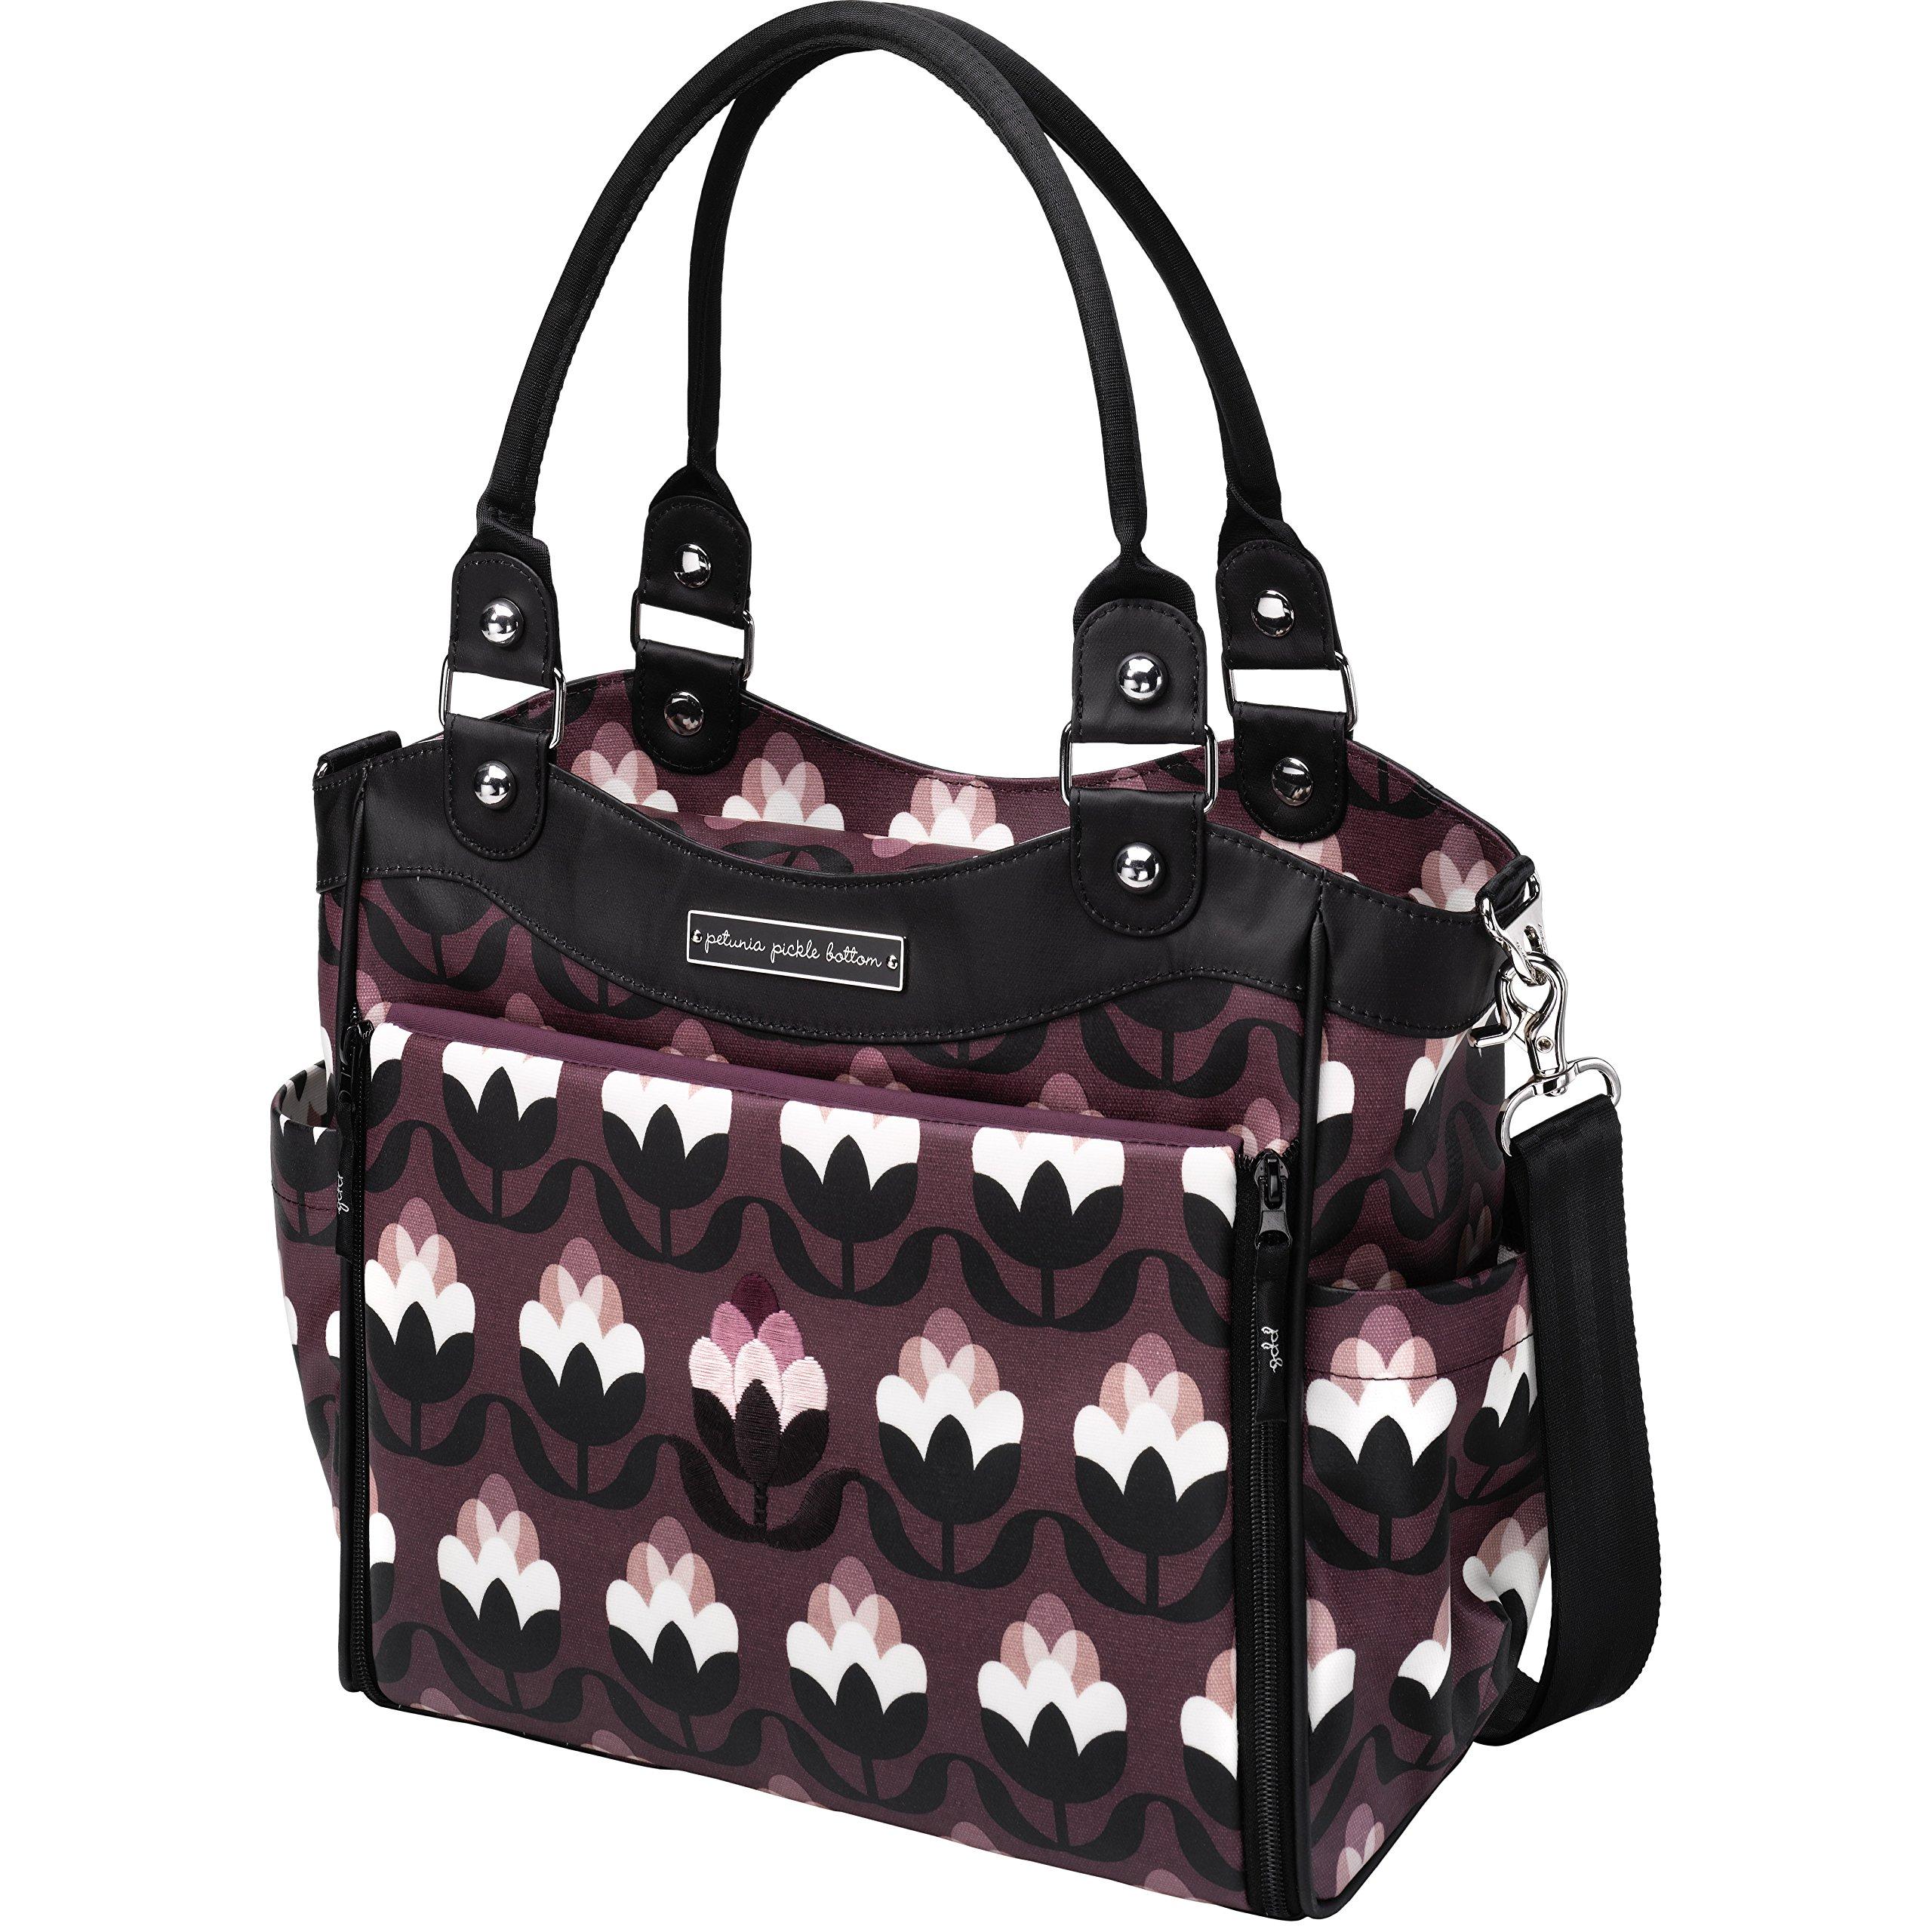 Petunia Pickle Bottom City Carryall Bag, Tuscan Twilight